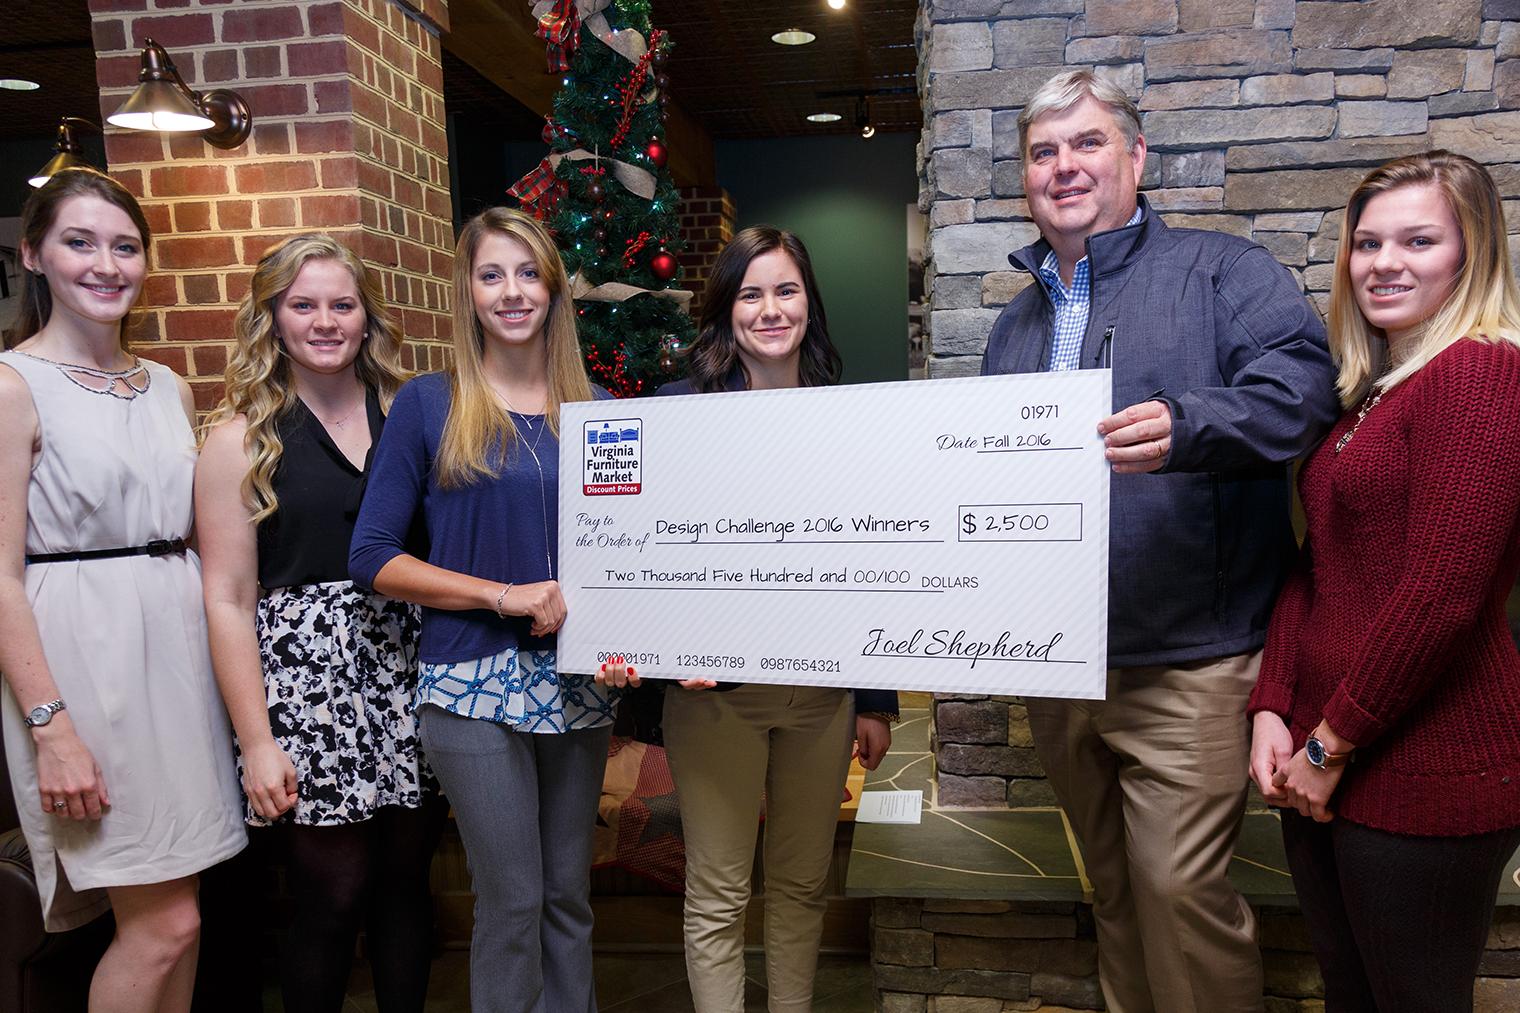 Virginia Furniture Market Owner Joel Shepherd Presents A $2,500 Award To Interior  Design Students (from